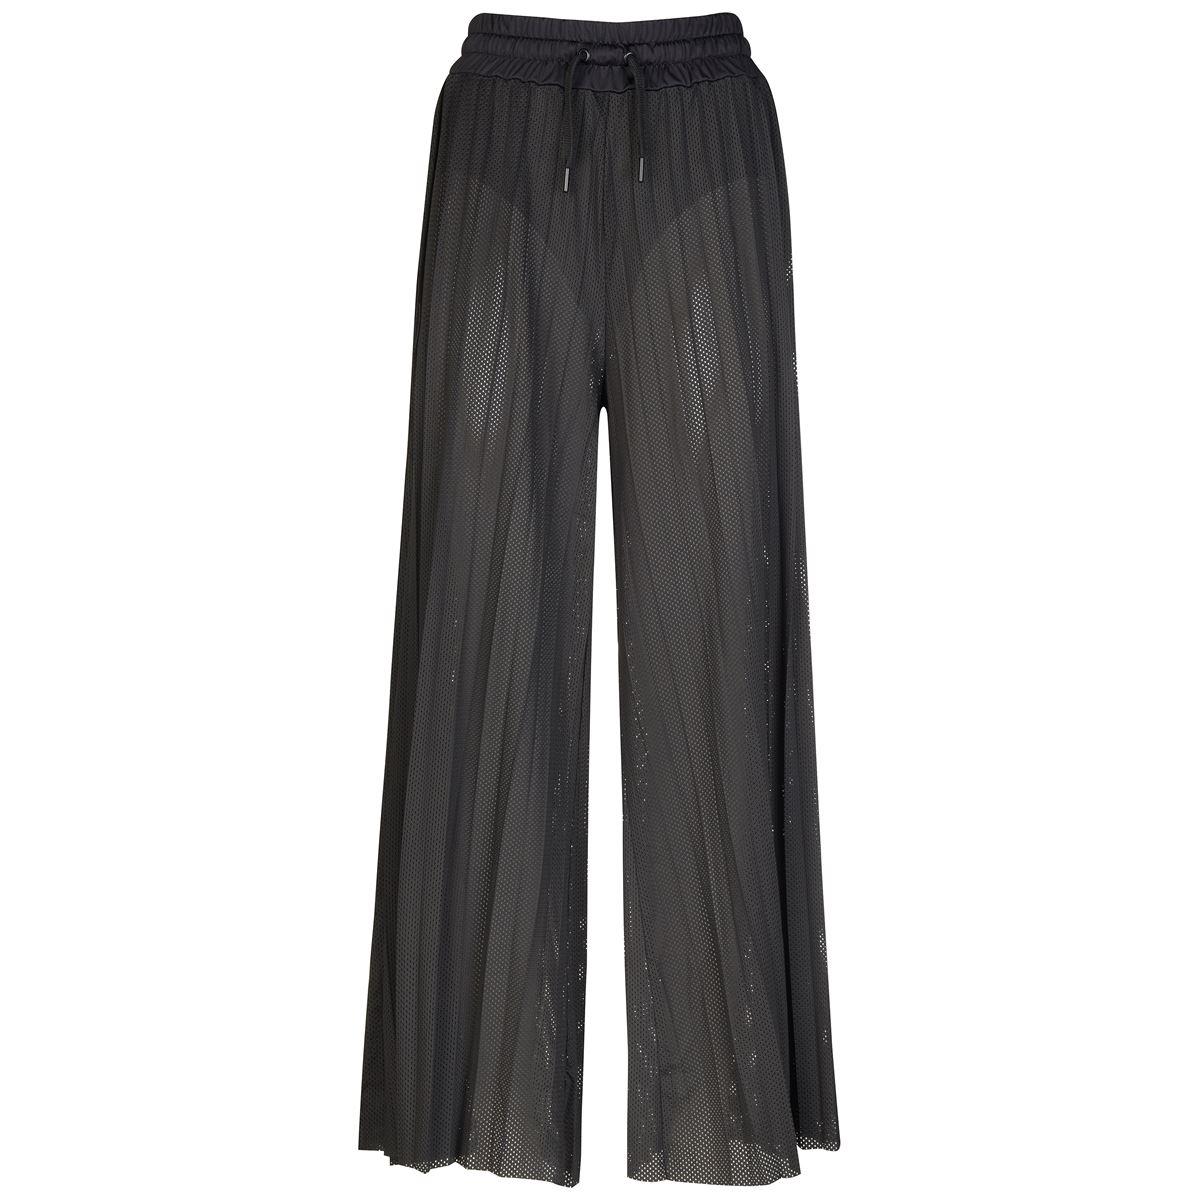 Kappa Pantaloni donna-304S1Q0